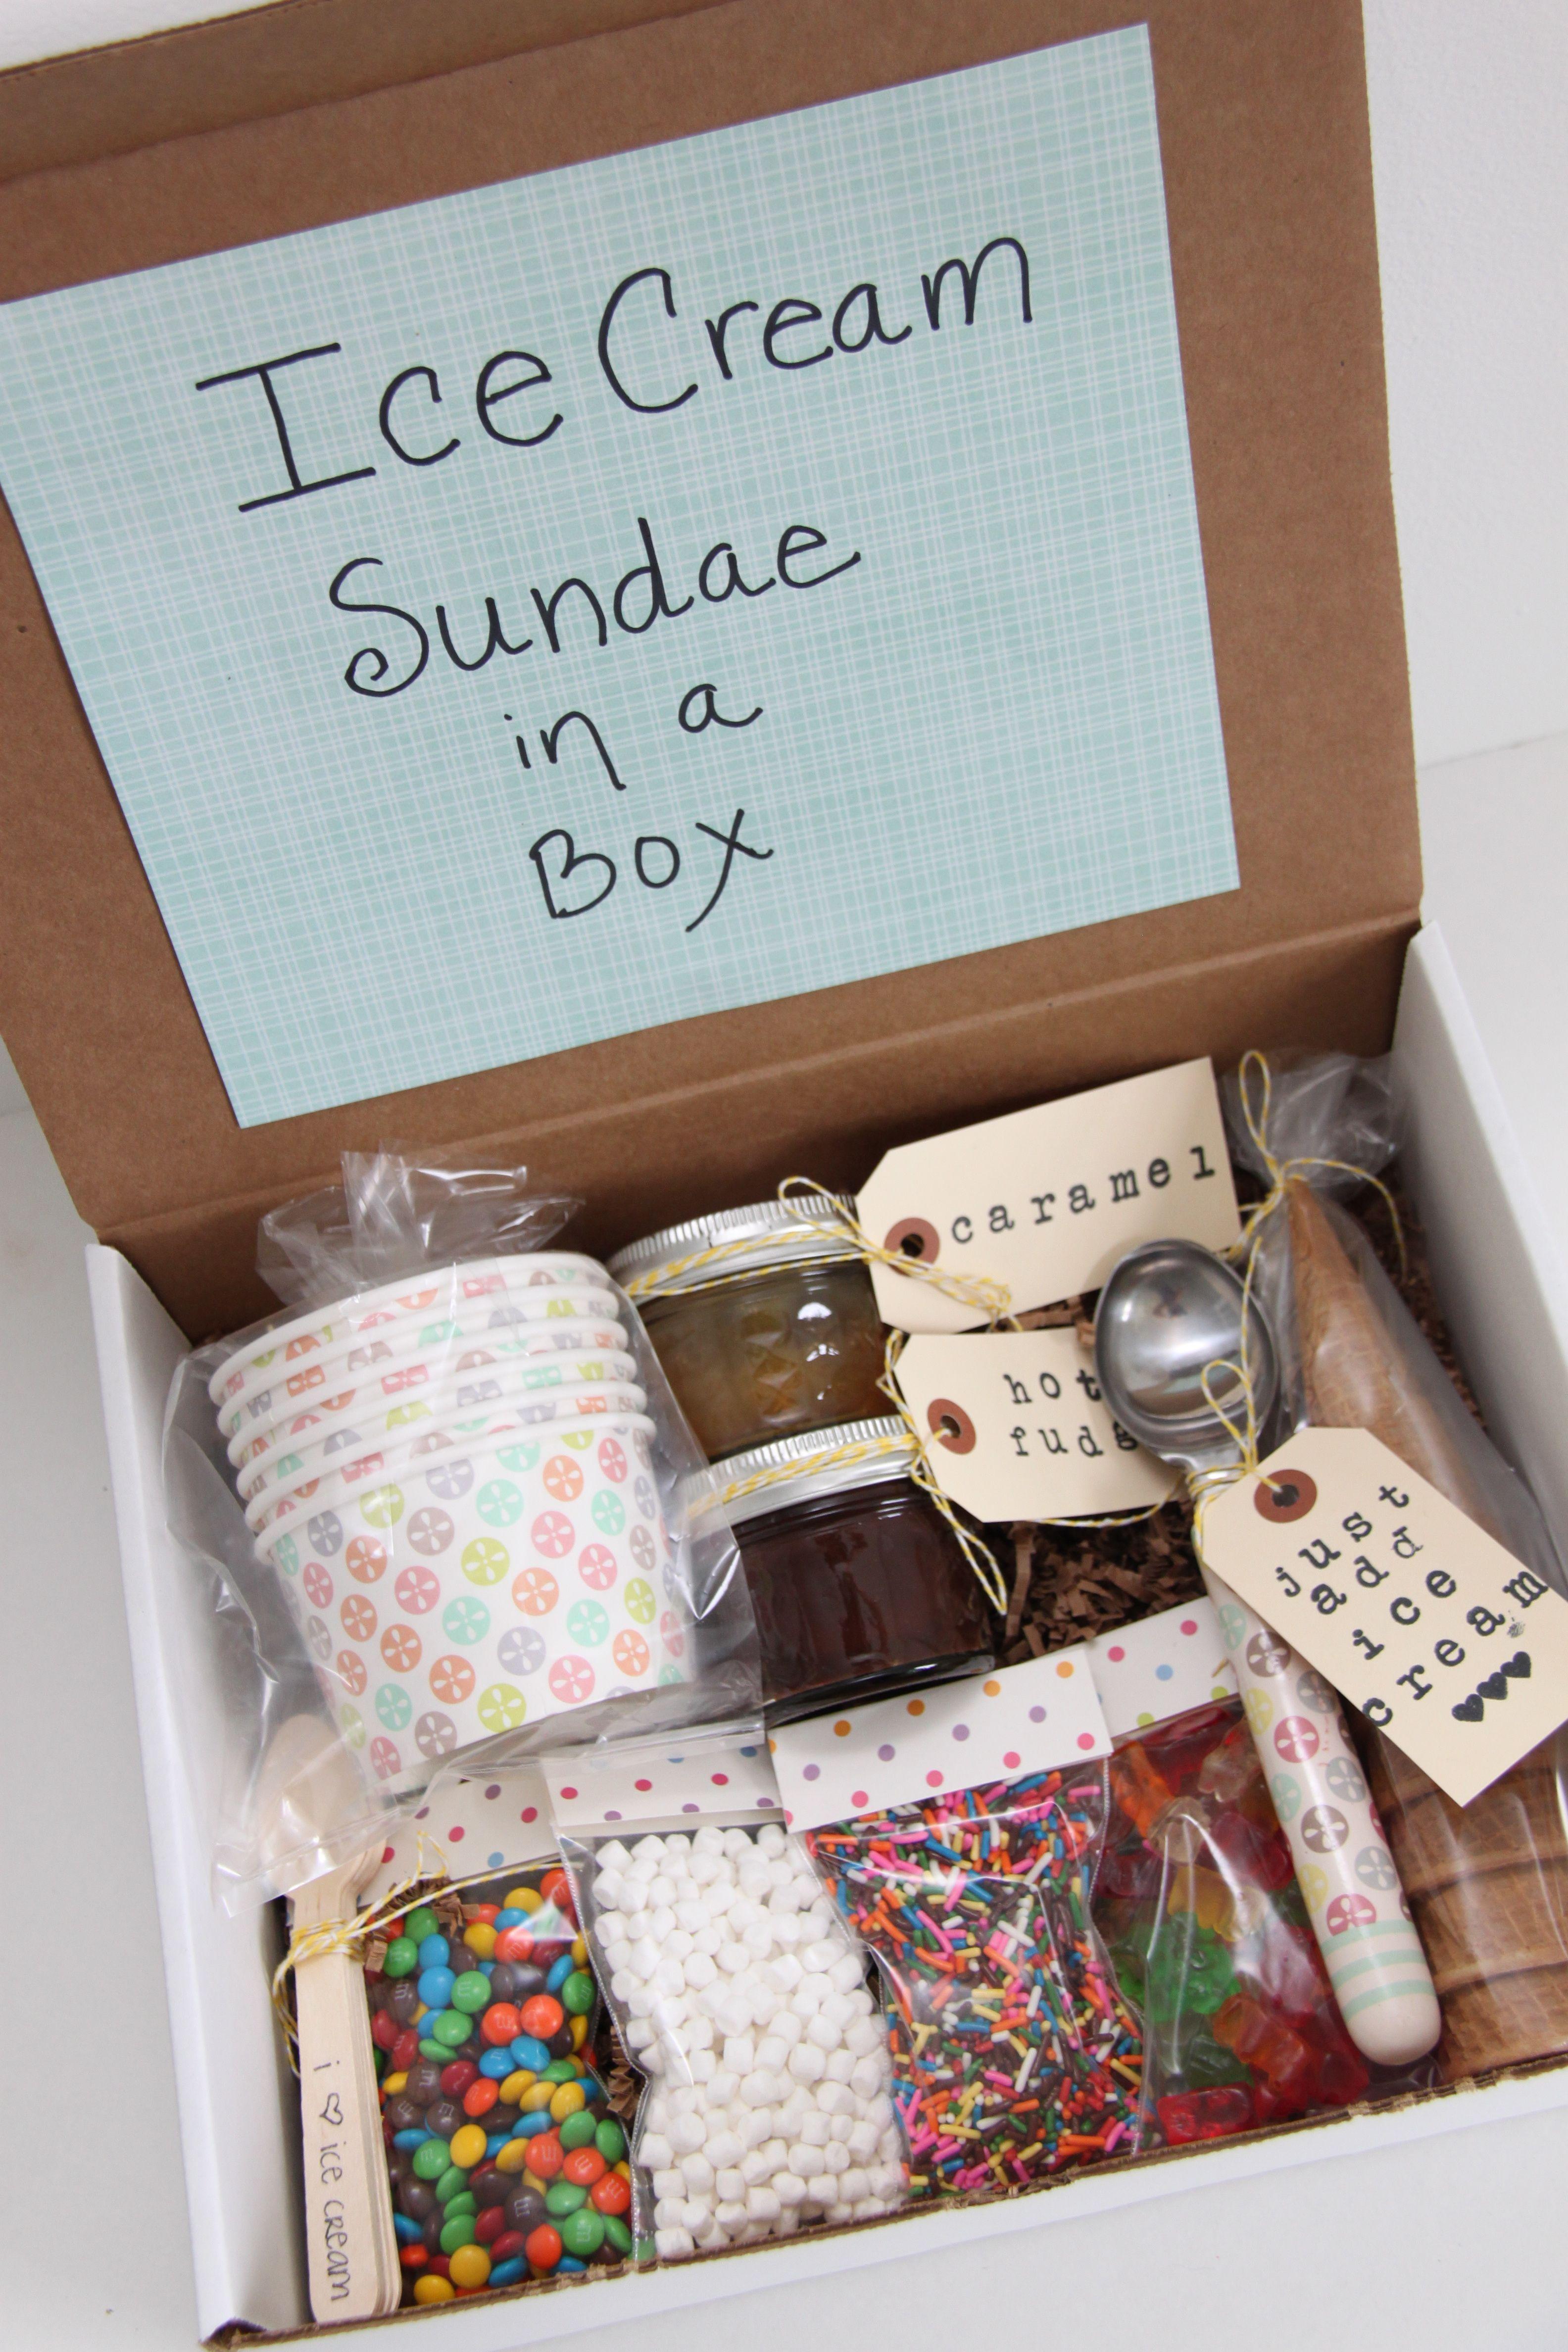 Ice Cream Sundae in a Box Gift Idea | Christmas | Pinterest | Gifts ...